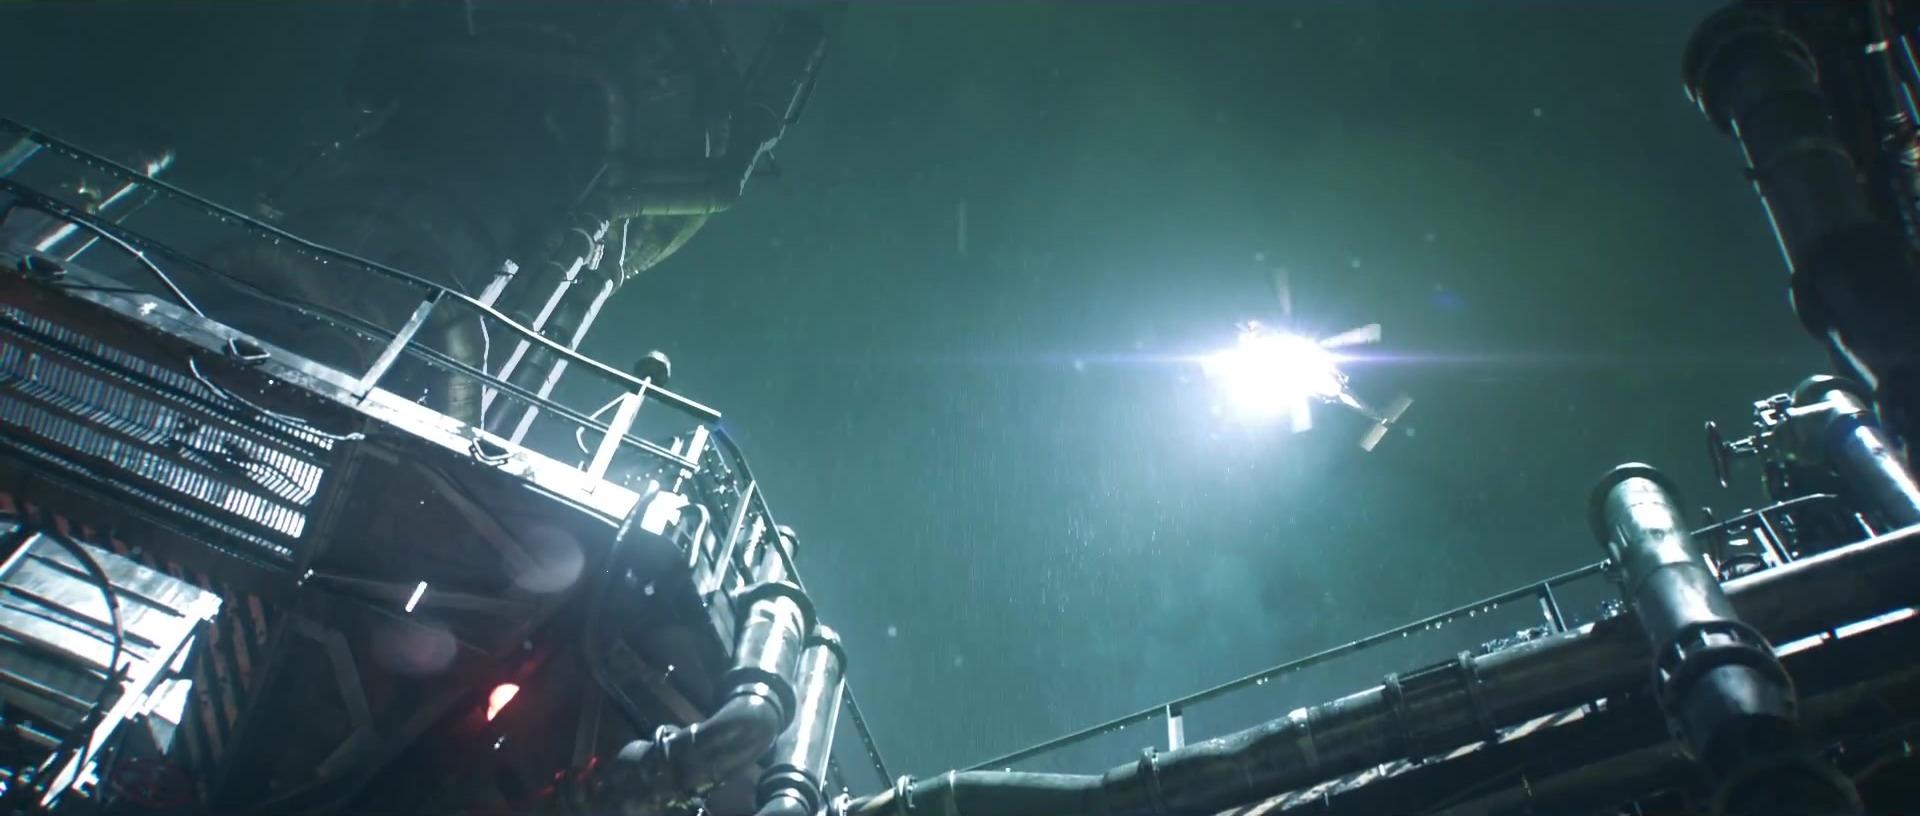 Visual Breakdown Of FFVII Remake Trailer The Lifestream